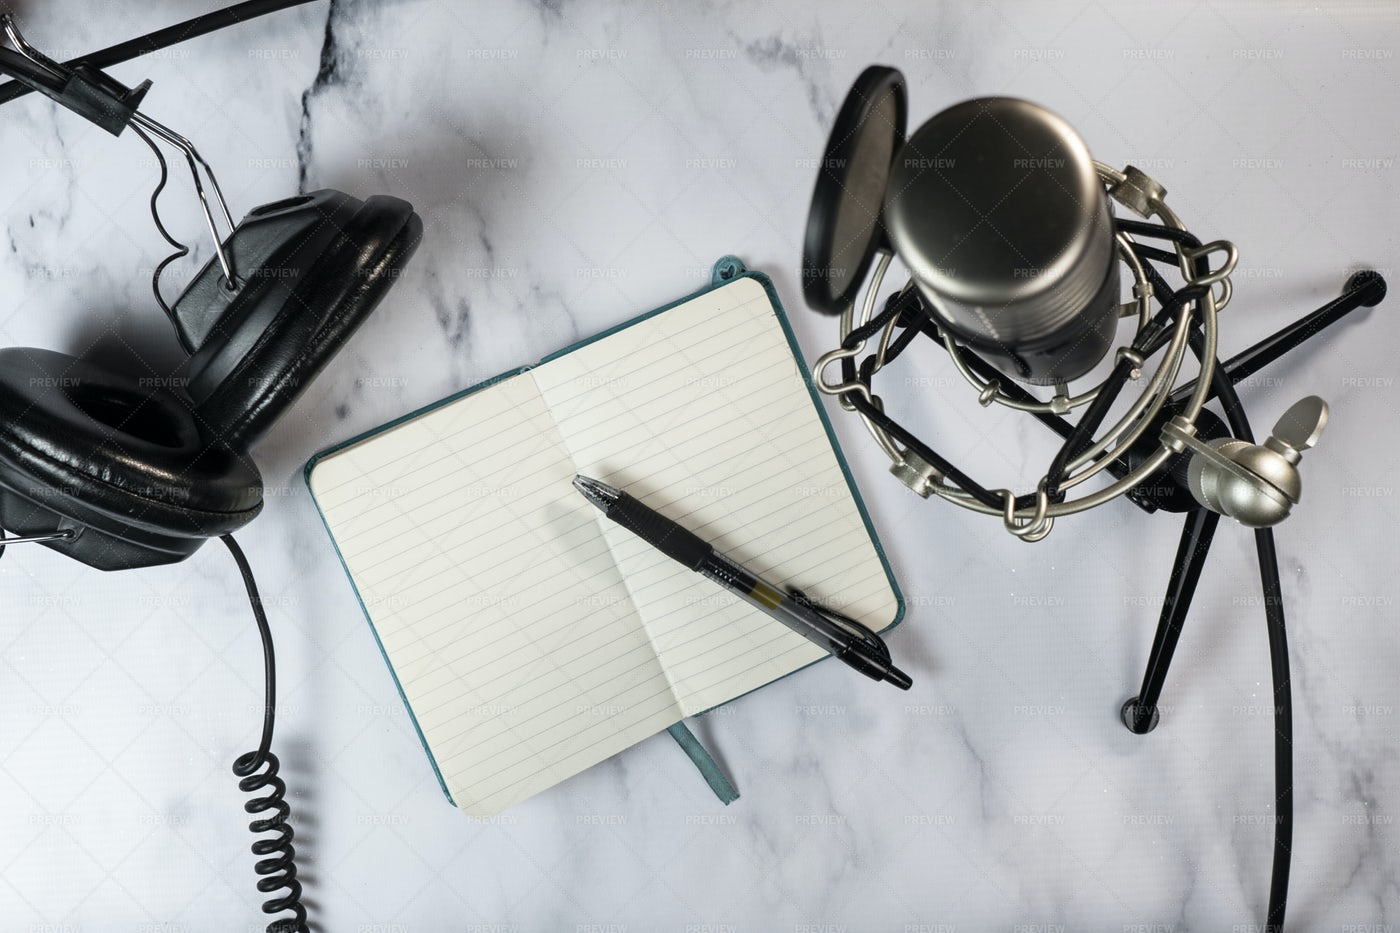 Podcast Setting: Stock Photos